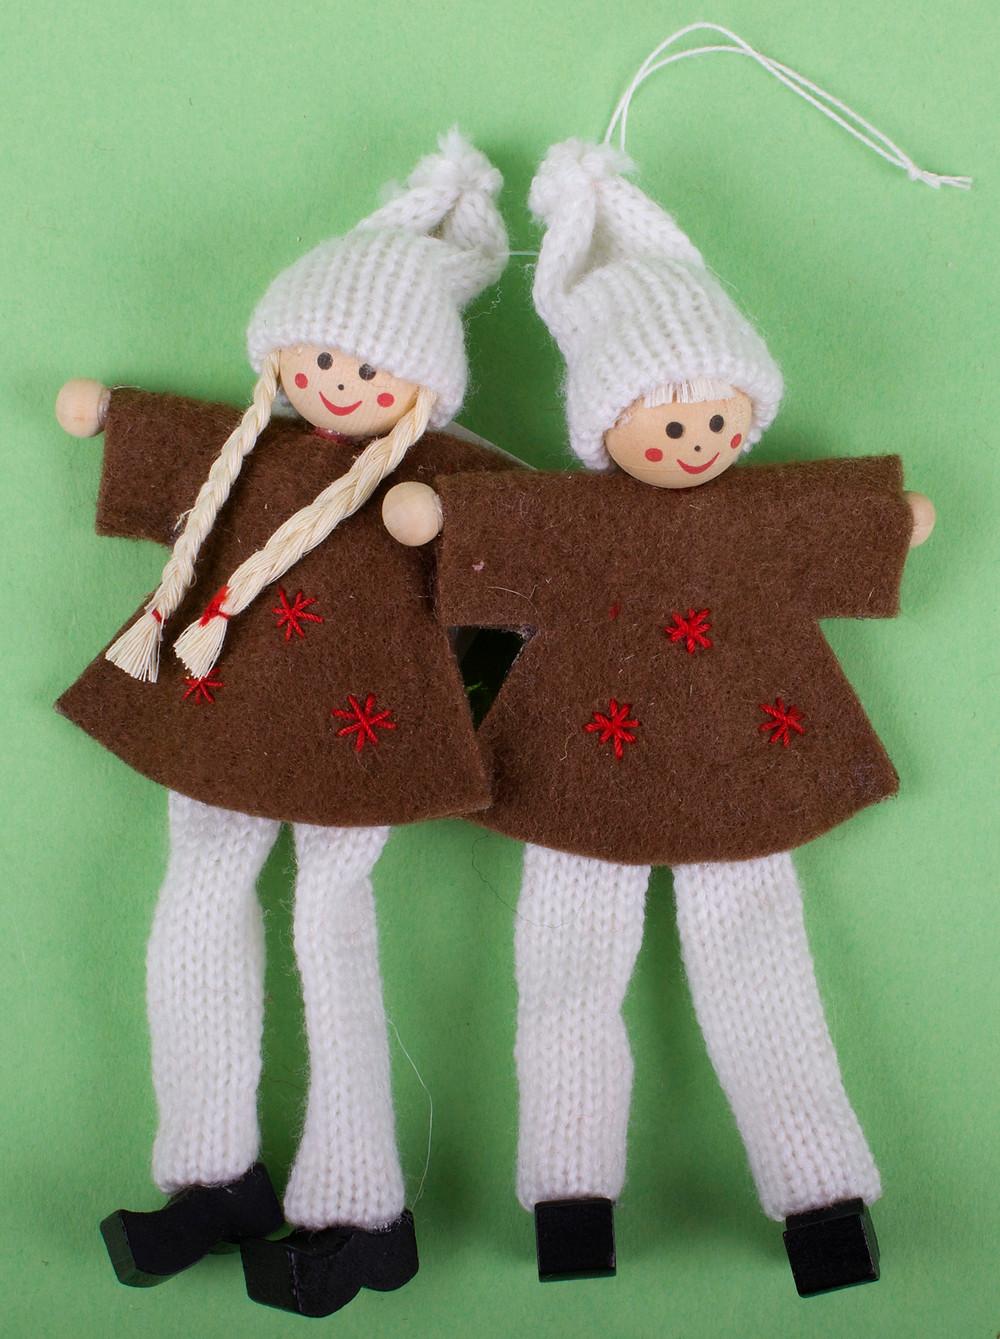 Karácsonyi filc dekor, filc figurák